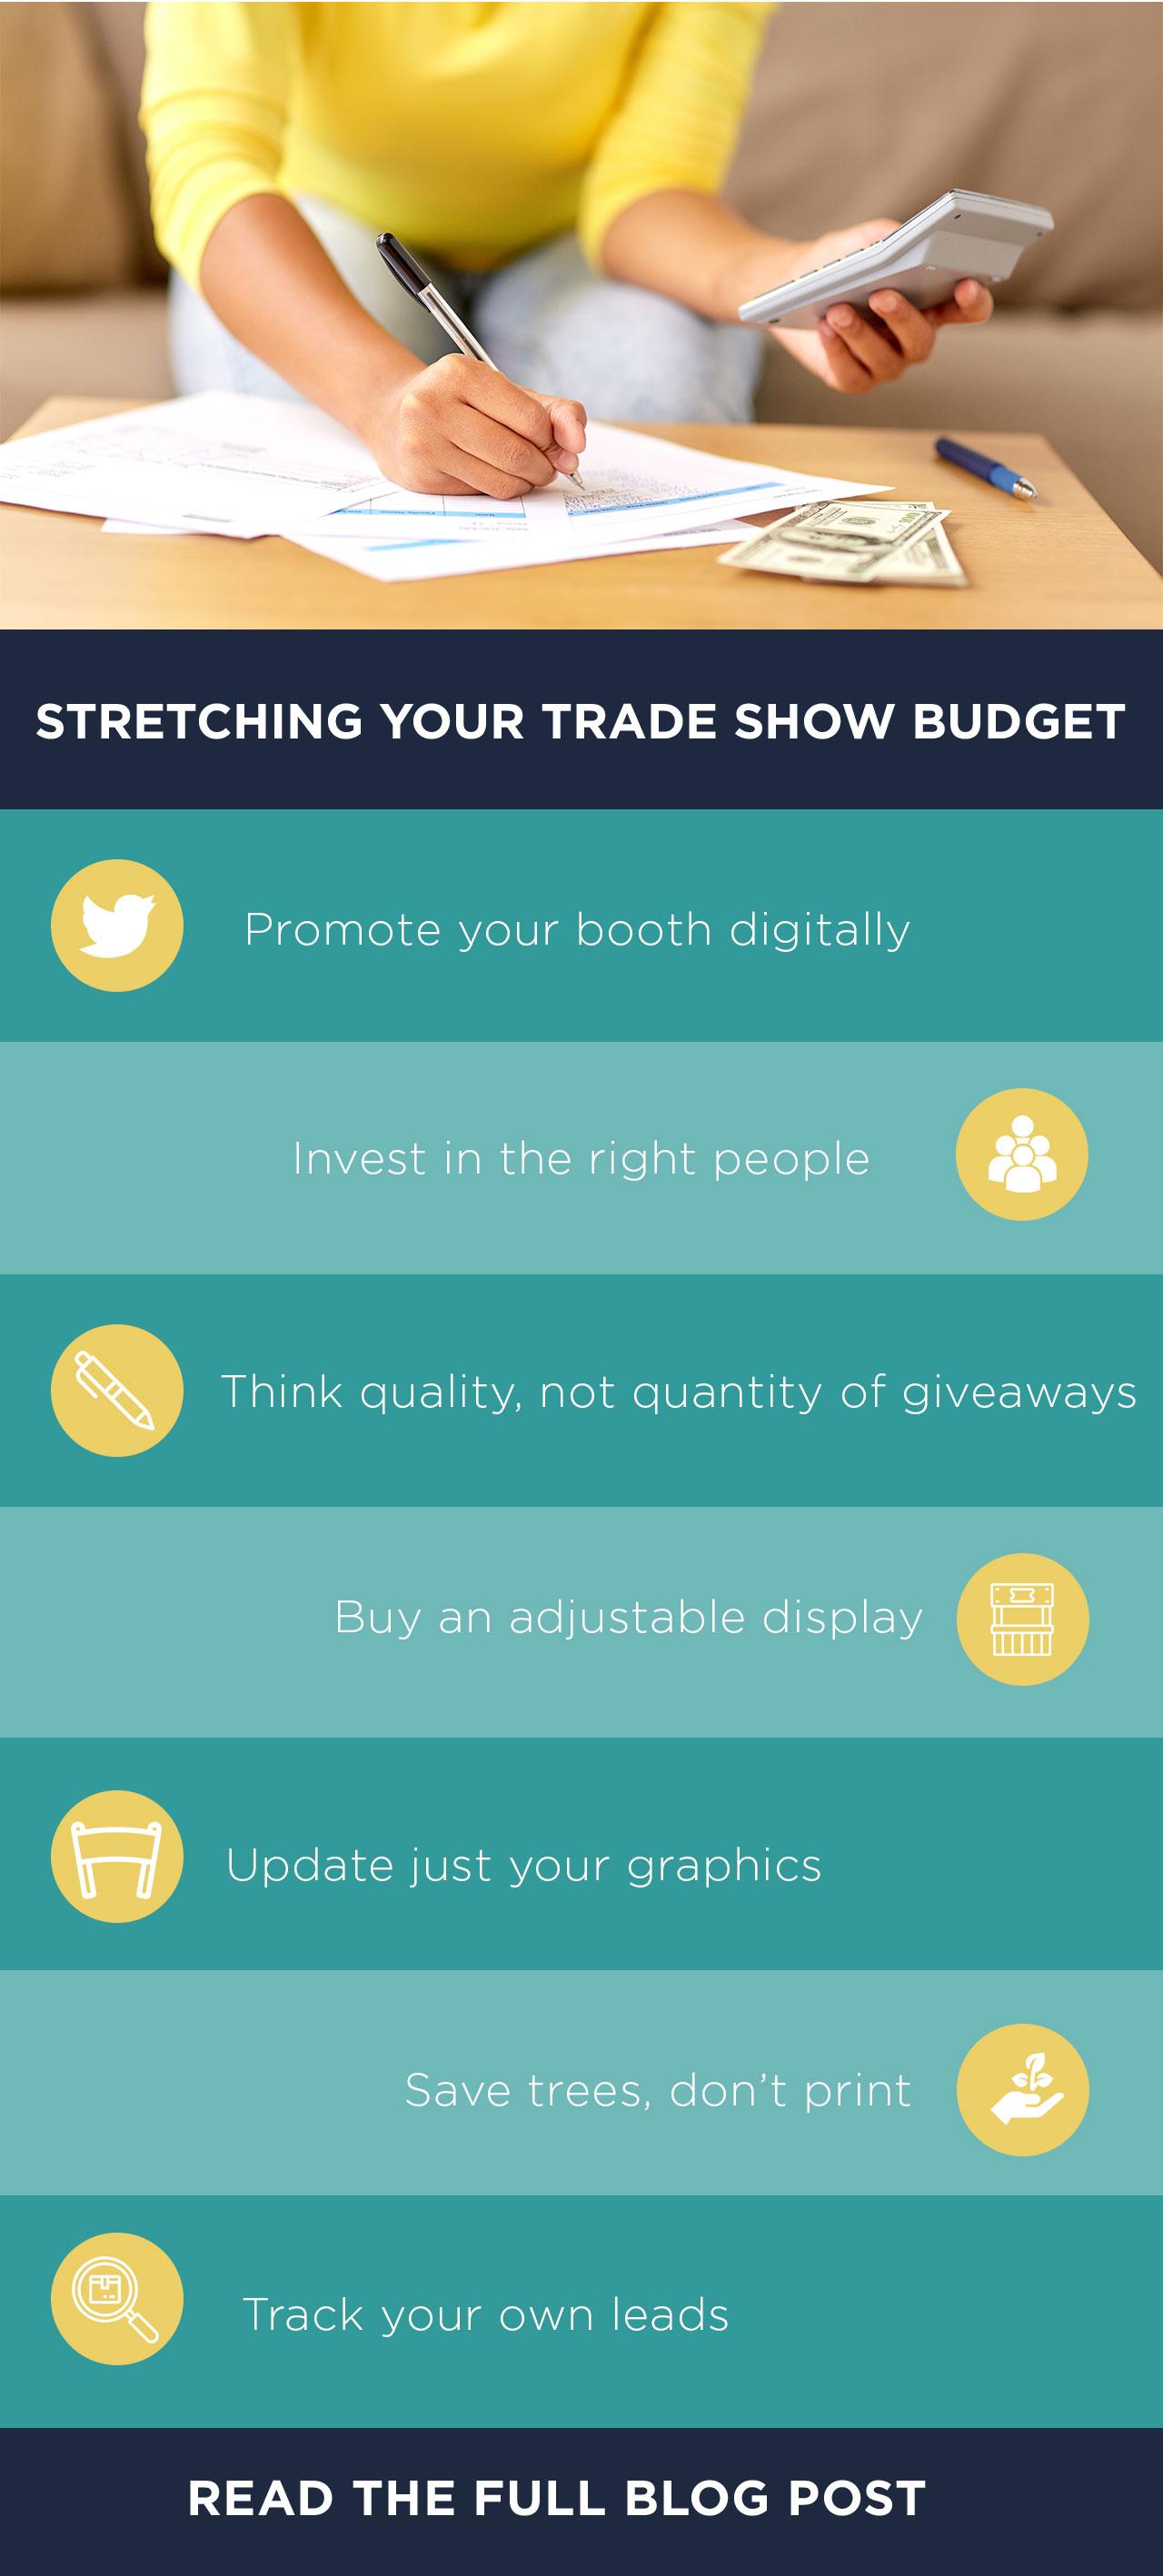 Stretching Your Trade Show Budget